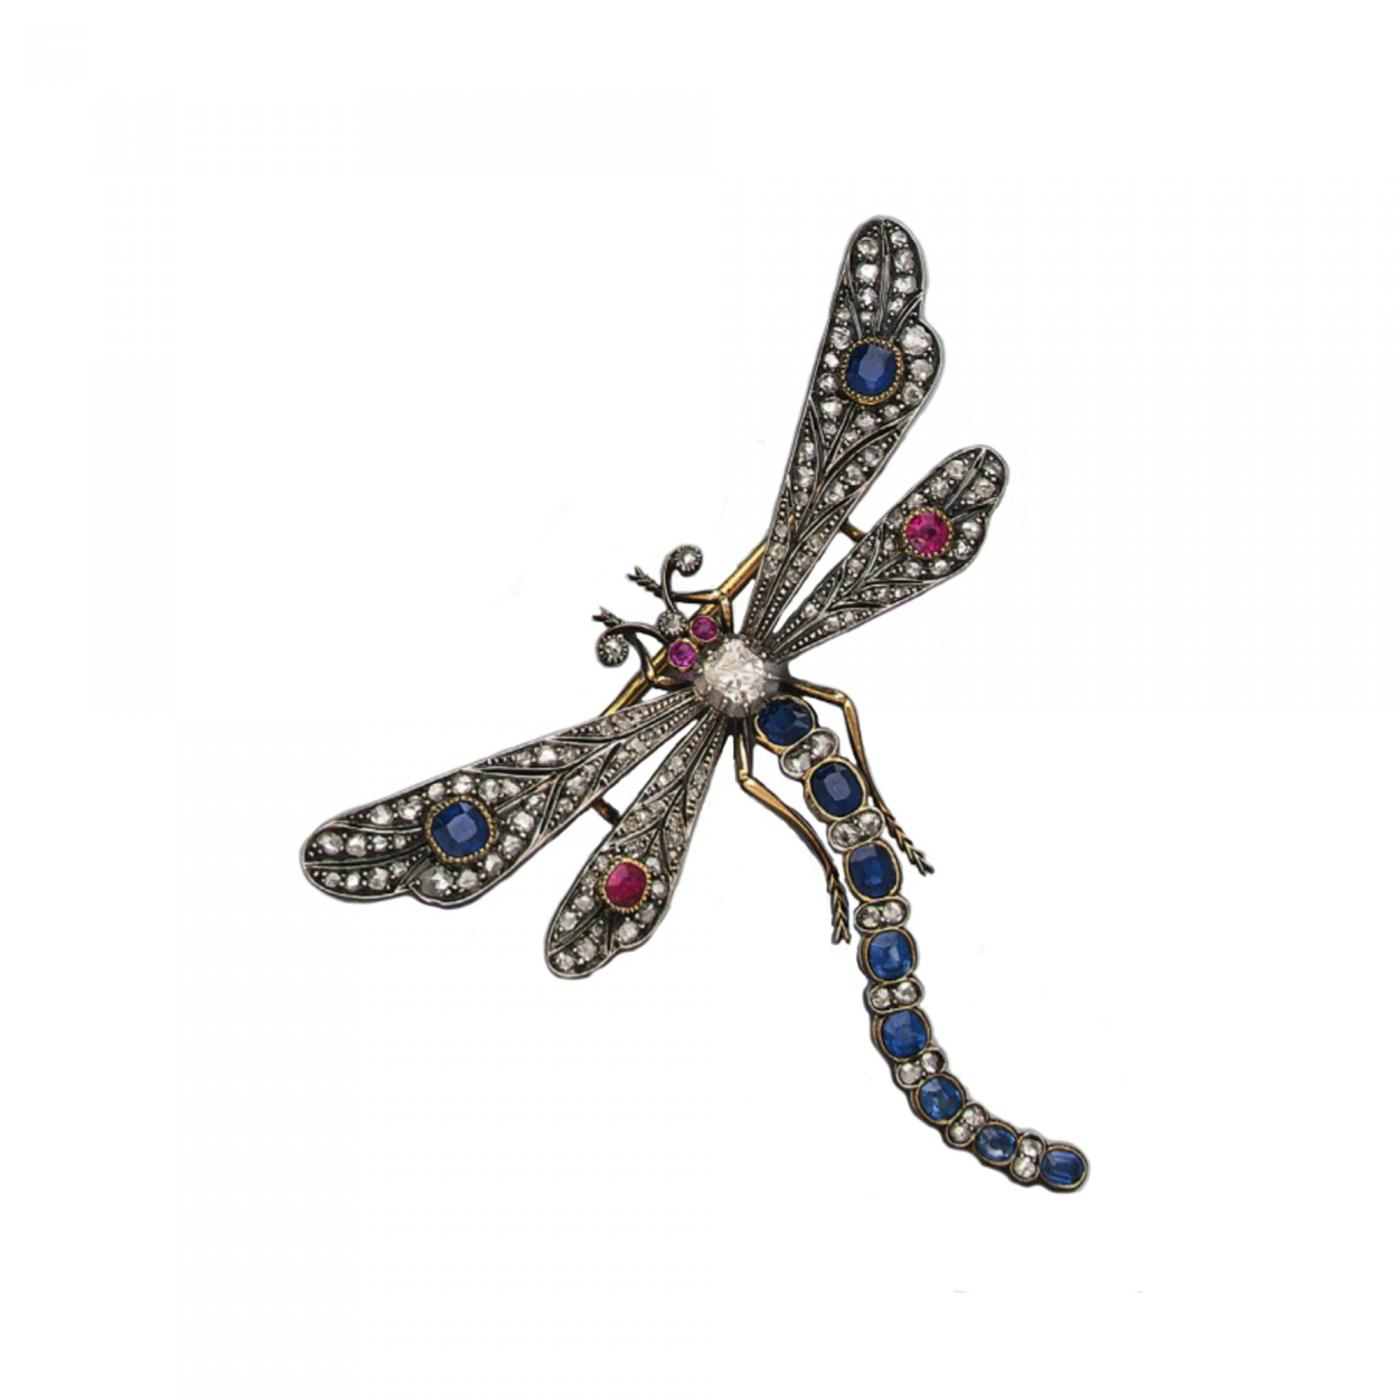 94c92ba0ad4c8 Large 1850s Diamond Ruby Sapphire Dragonfly Brooch /Pendant